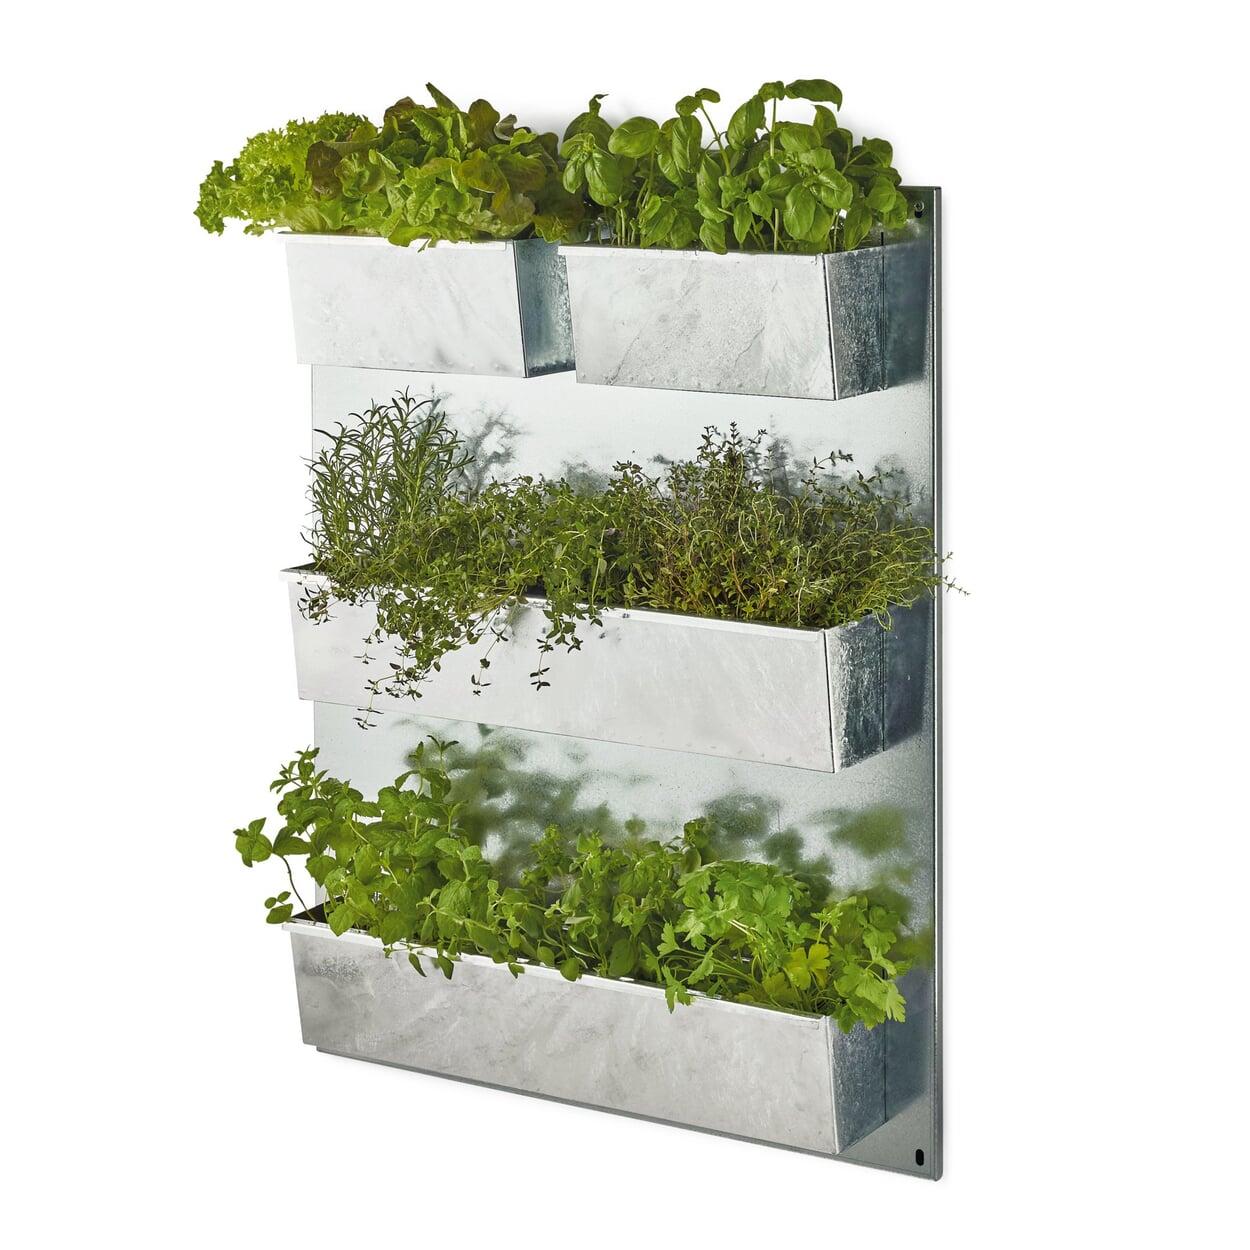 Vertikaler Garten Stahl verzinkt